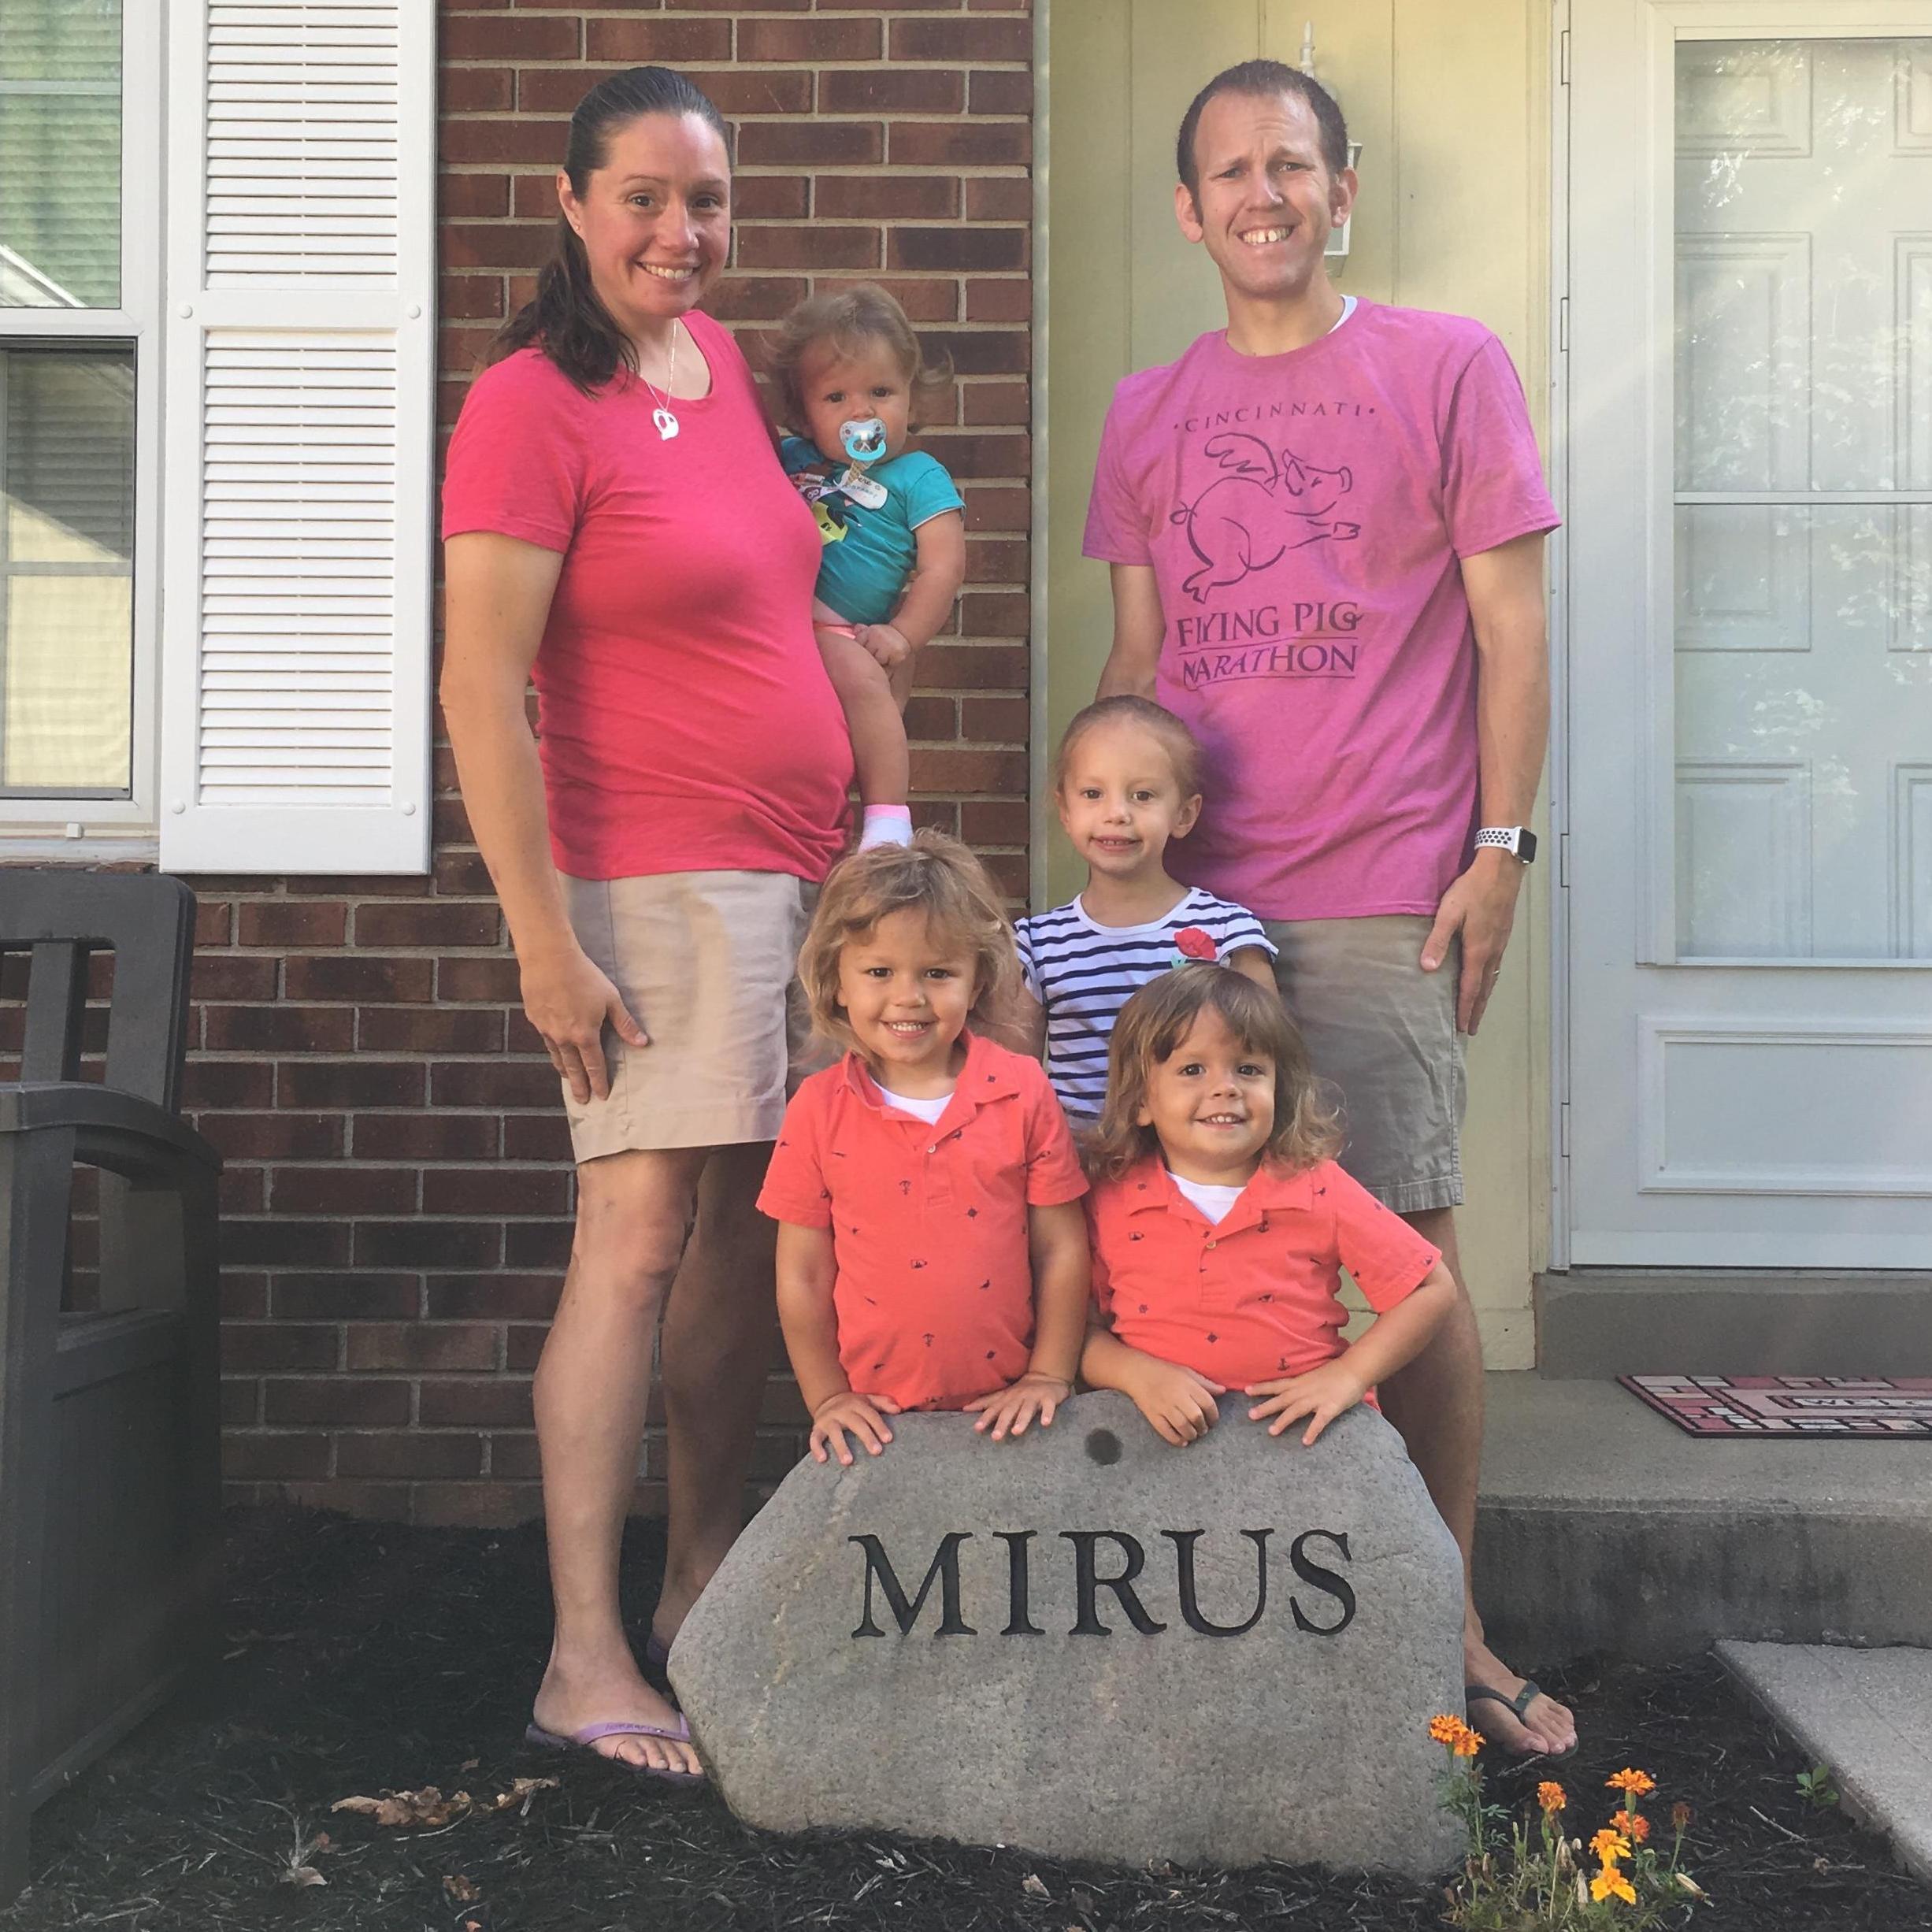 Missy Mirus's Profile Photo